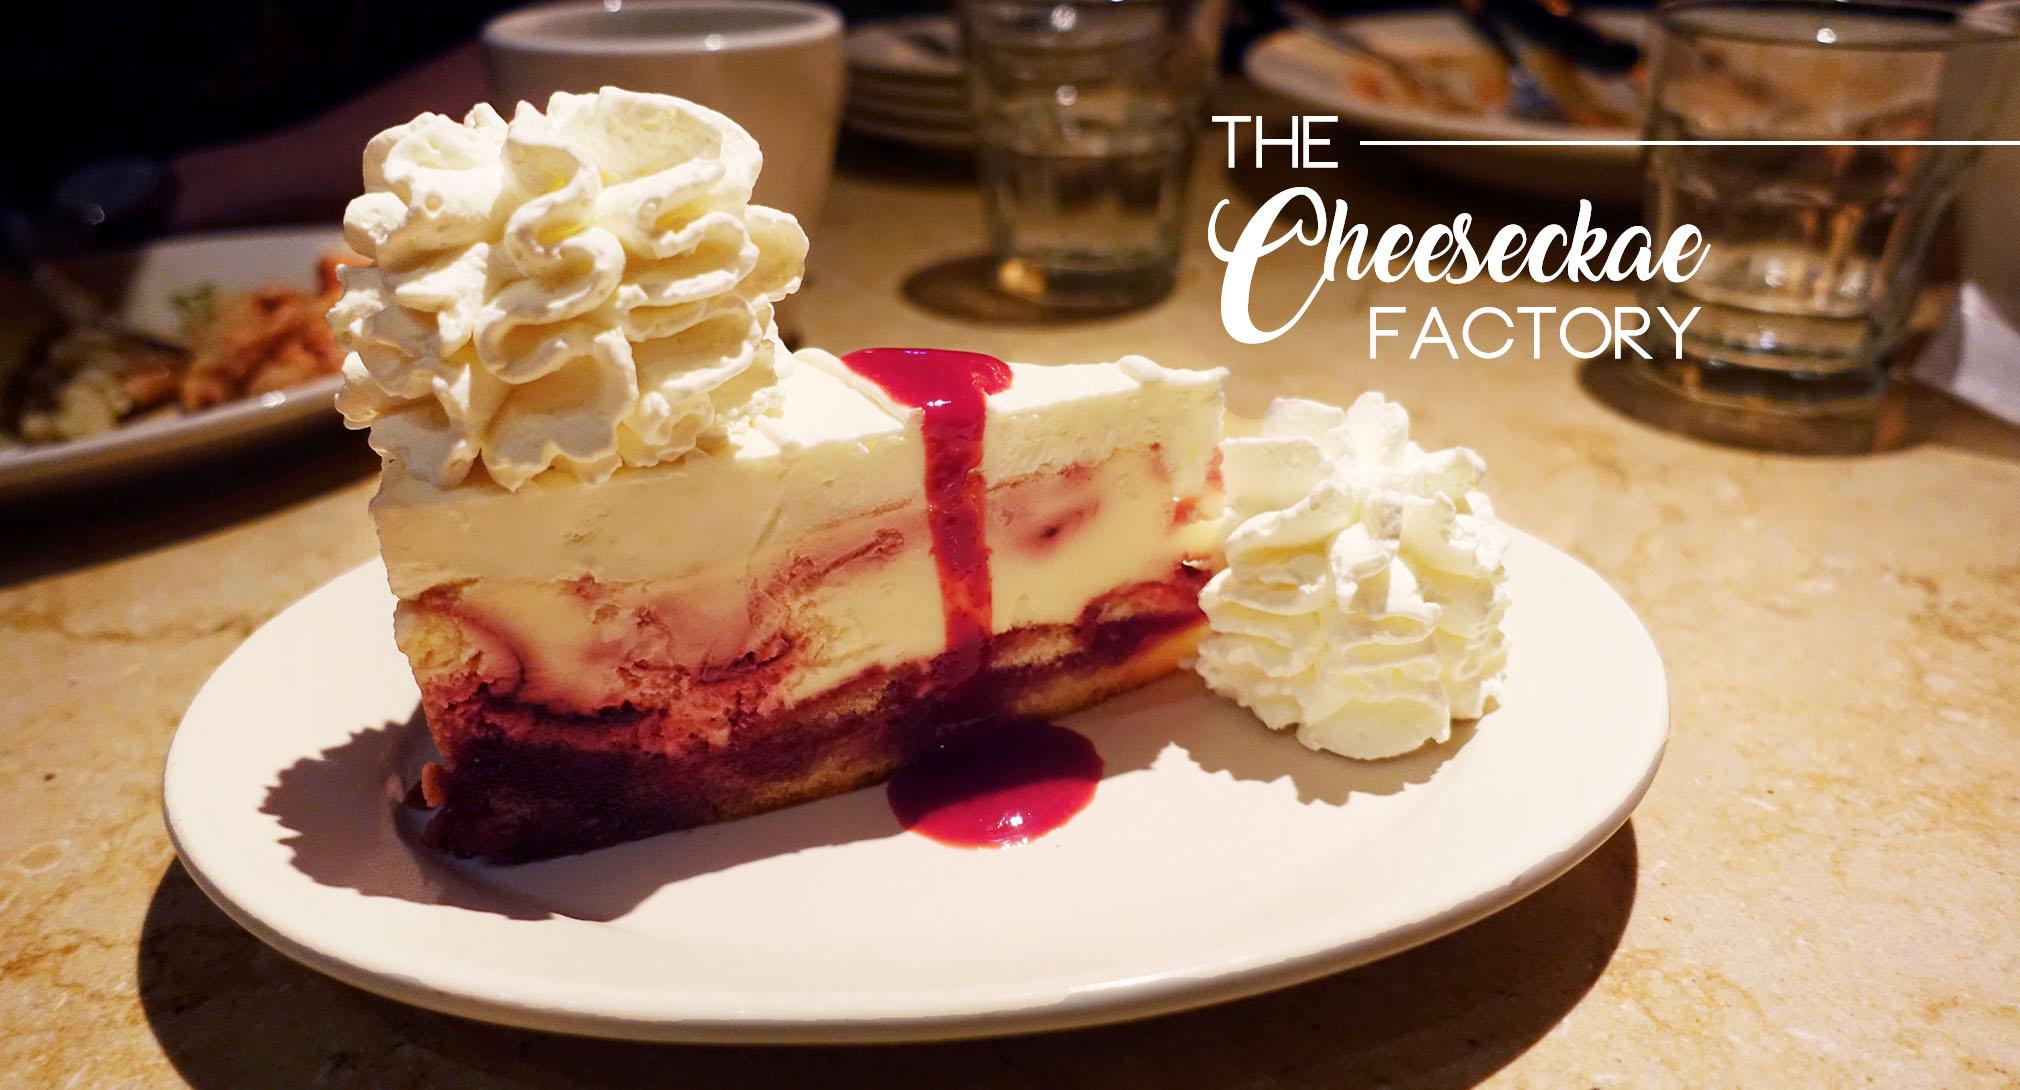 The cheeseckae factory